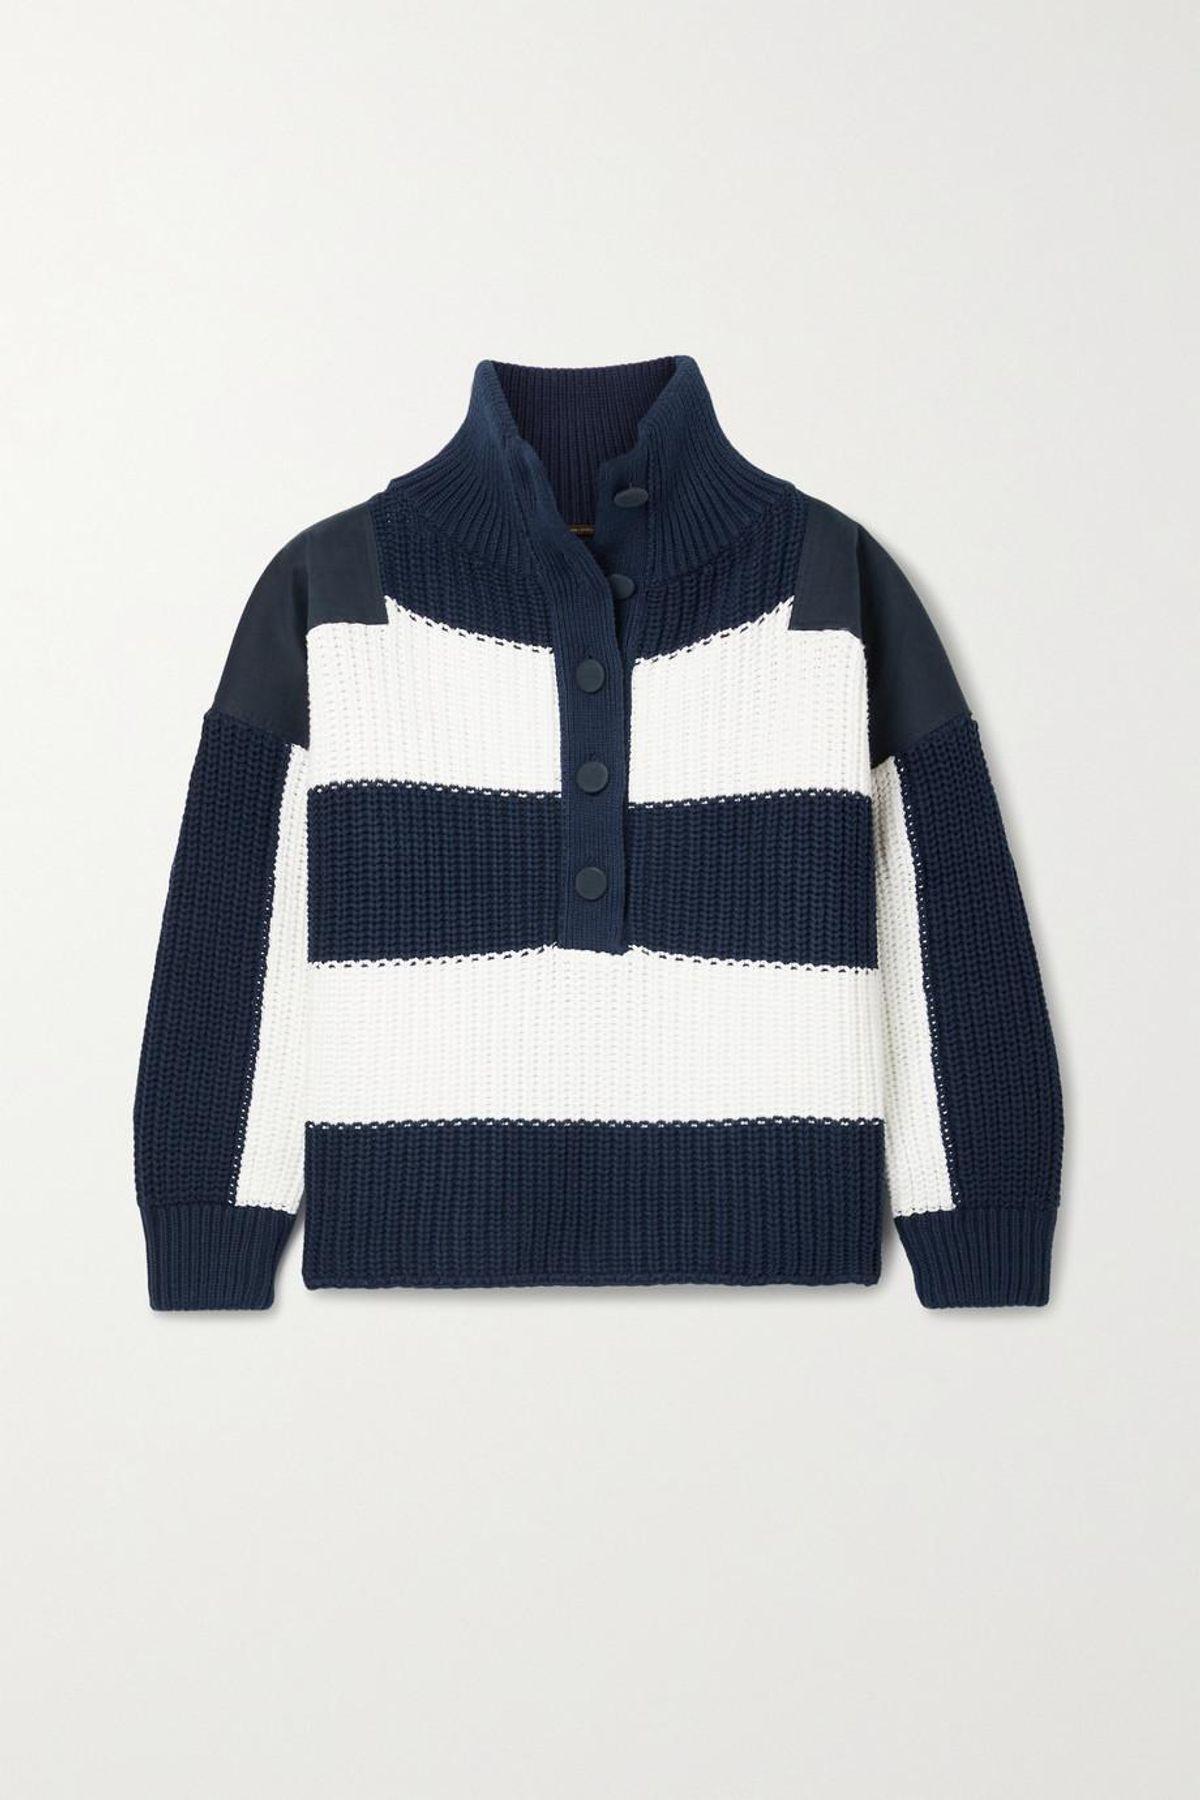 adam lippes oversized twill paneled striped ribbed cotton sweater